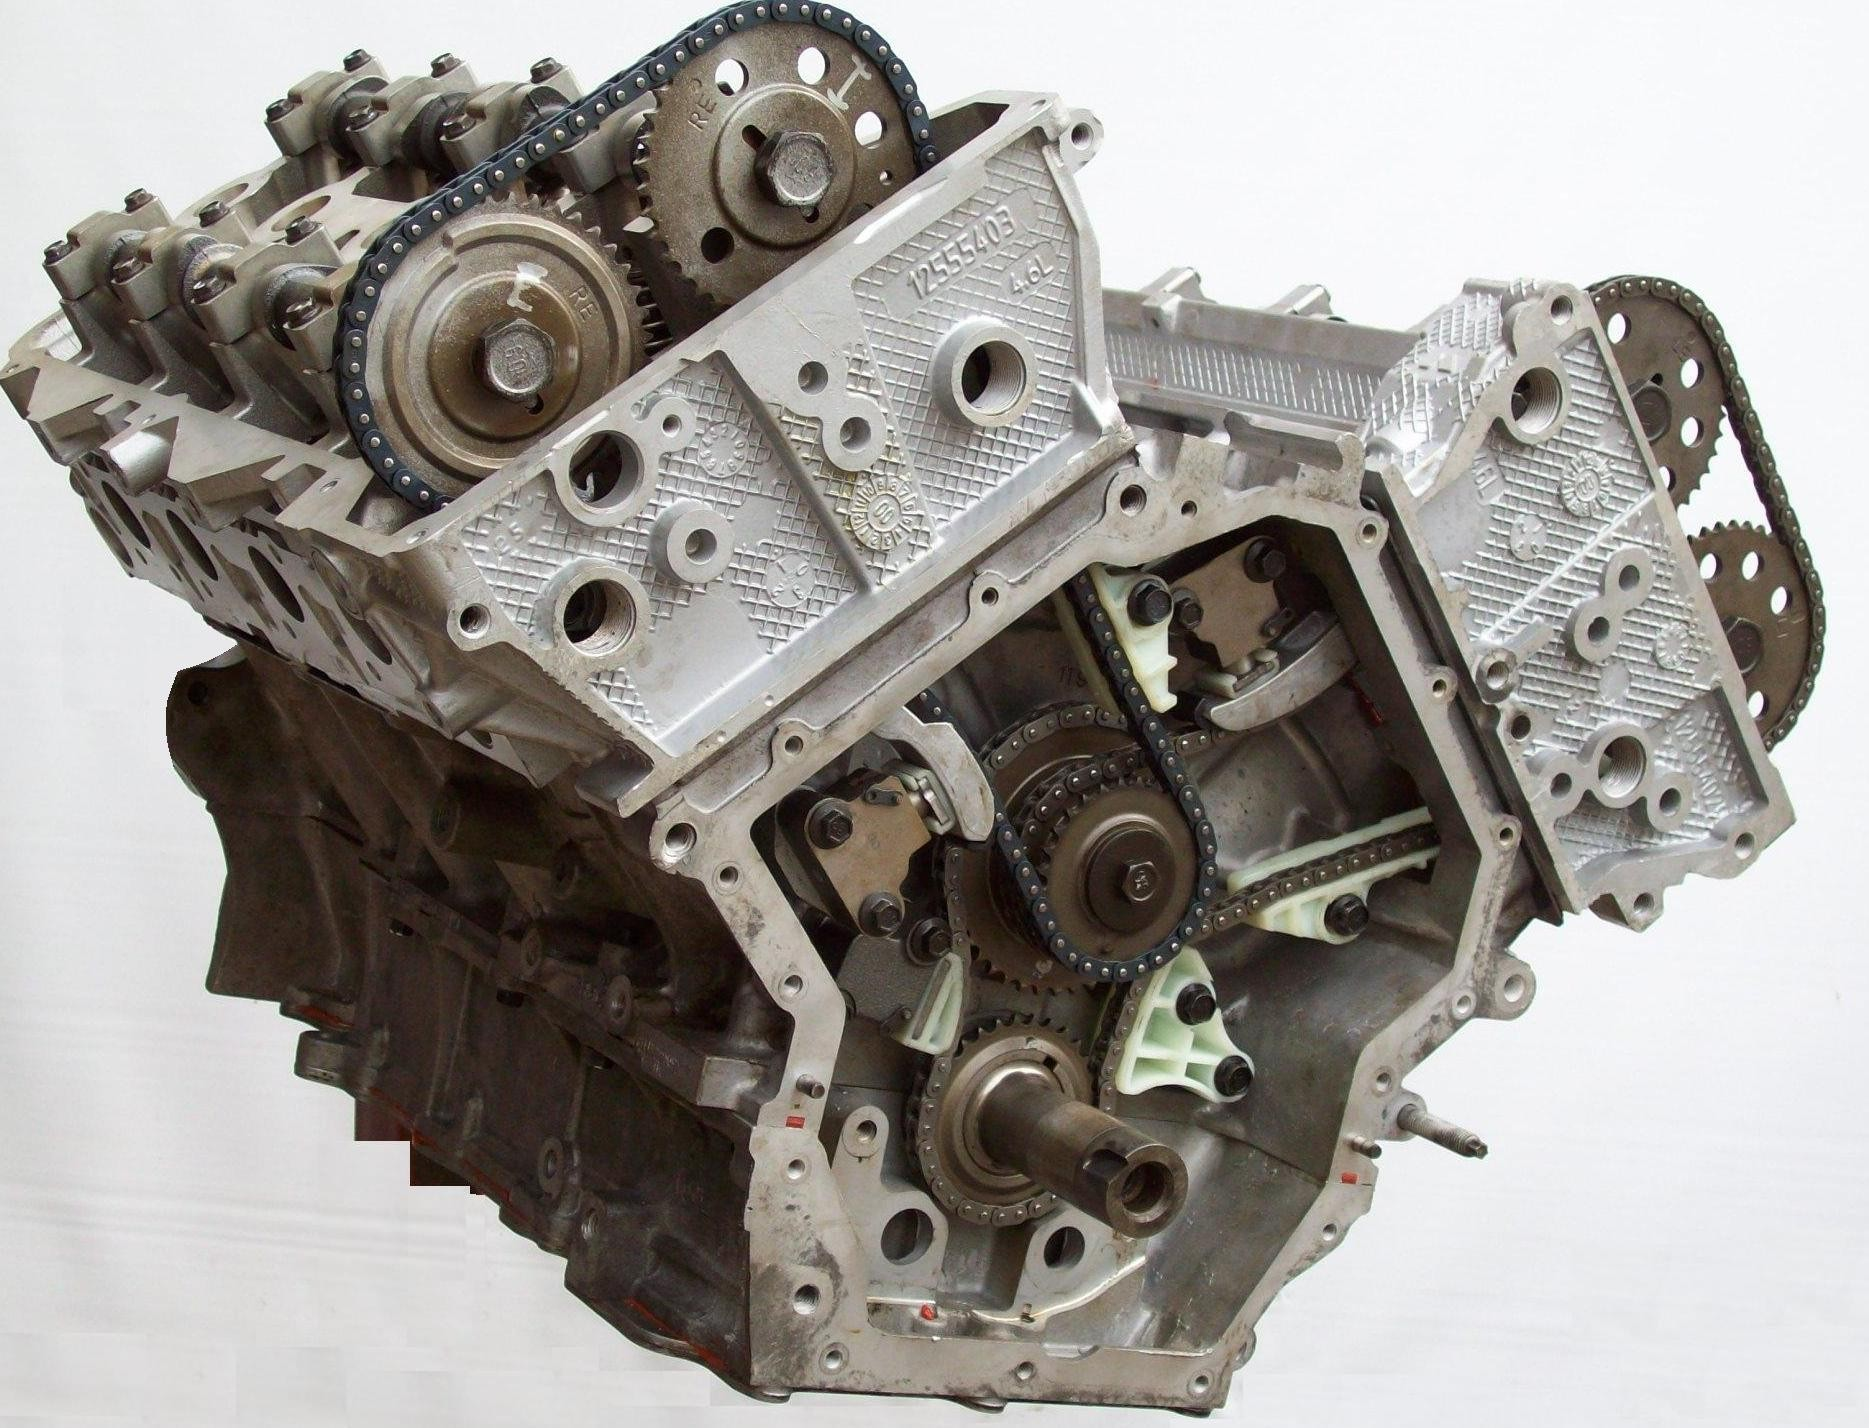 4 6 northstar Engine Diagram 2 north Star Engine Parts Diagram Furthermore Cadillac northstar Of 4 6 northstar Engine Diagram 2